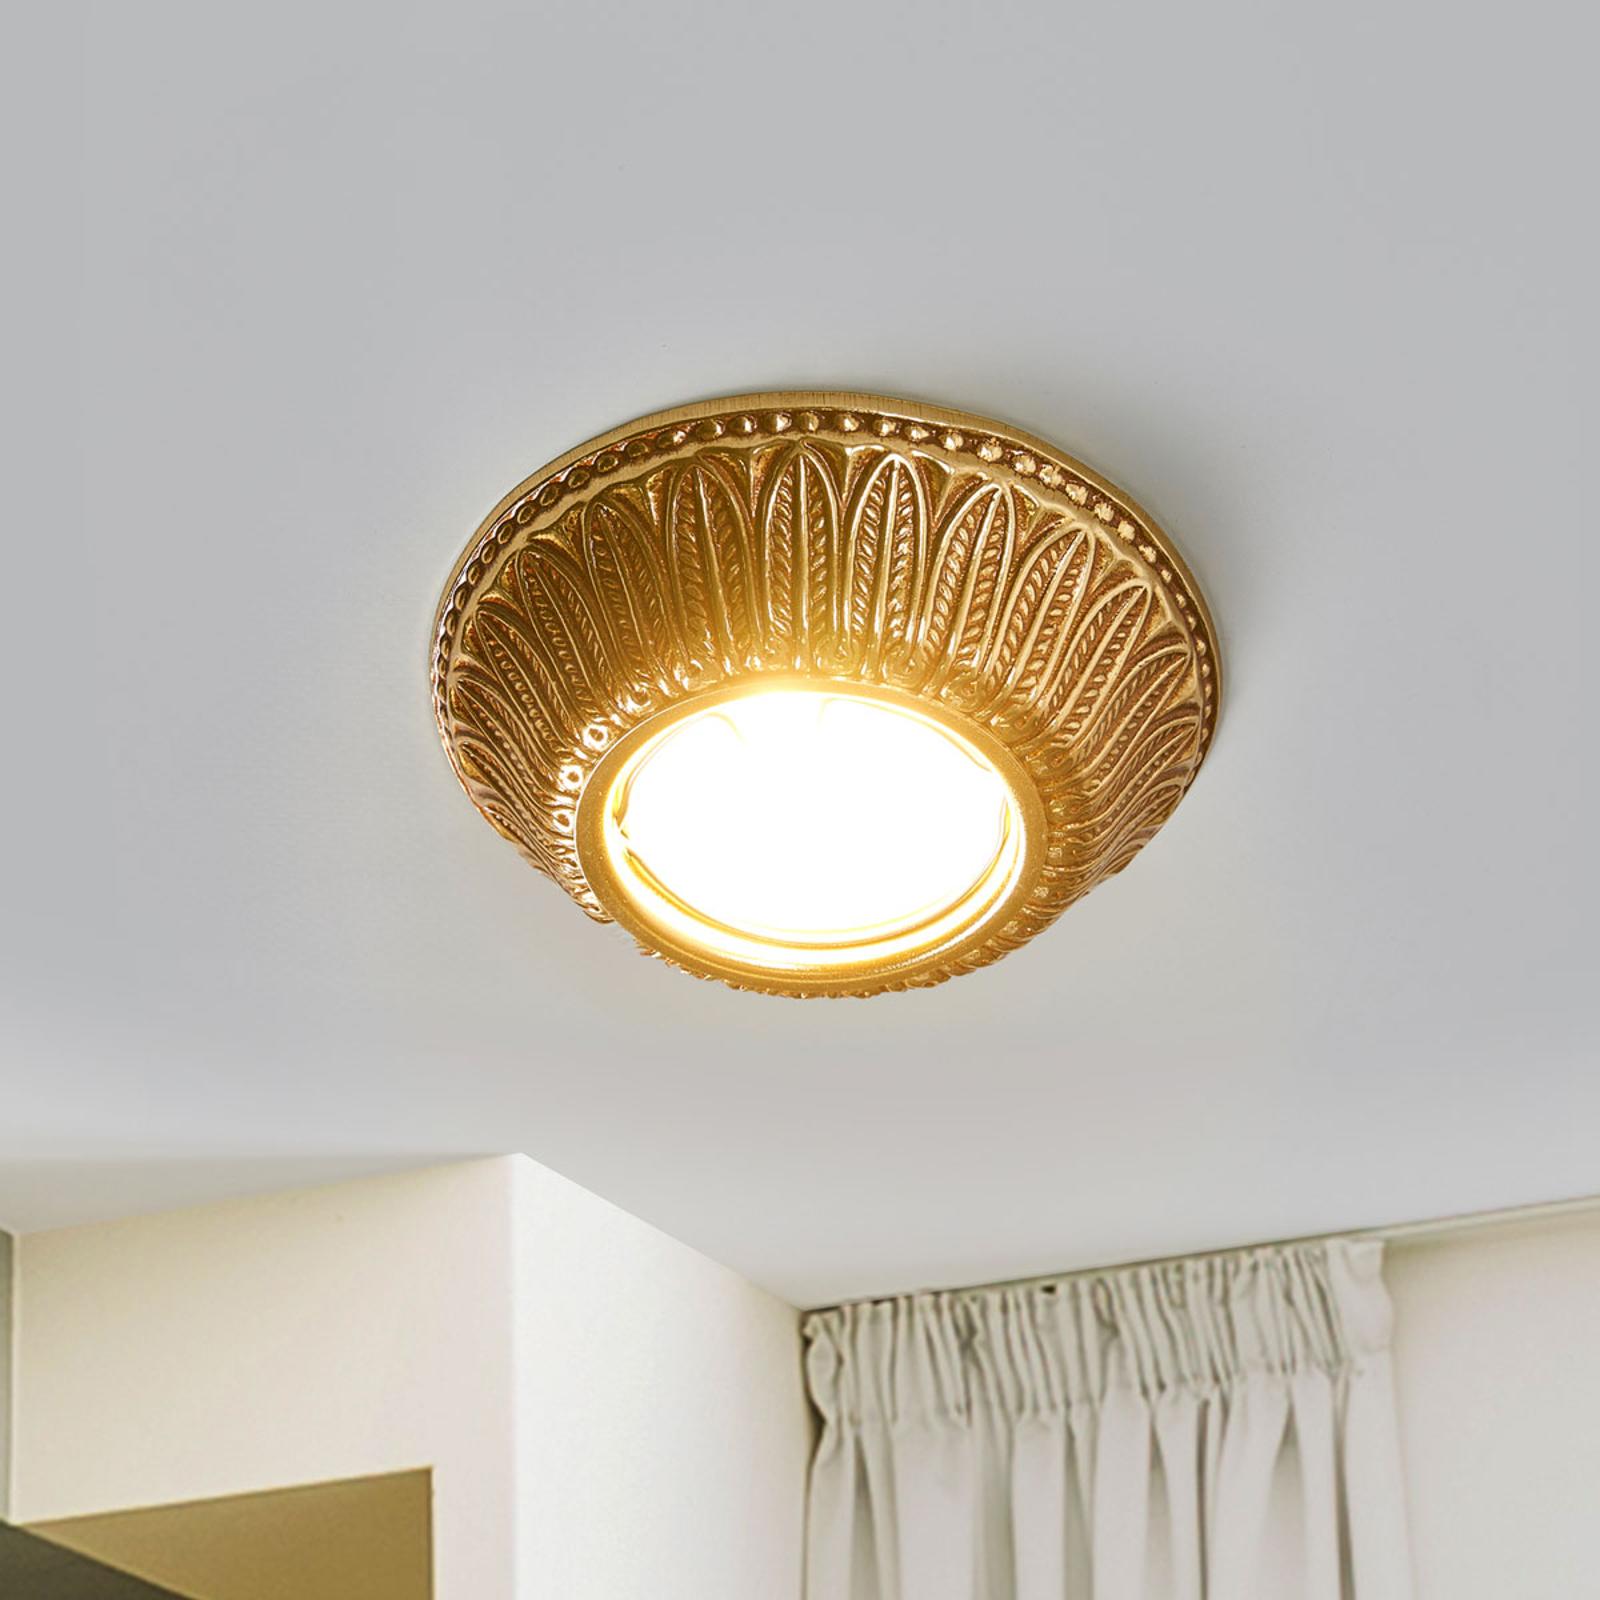 LED-downlight Liberty - finish i English Patina